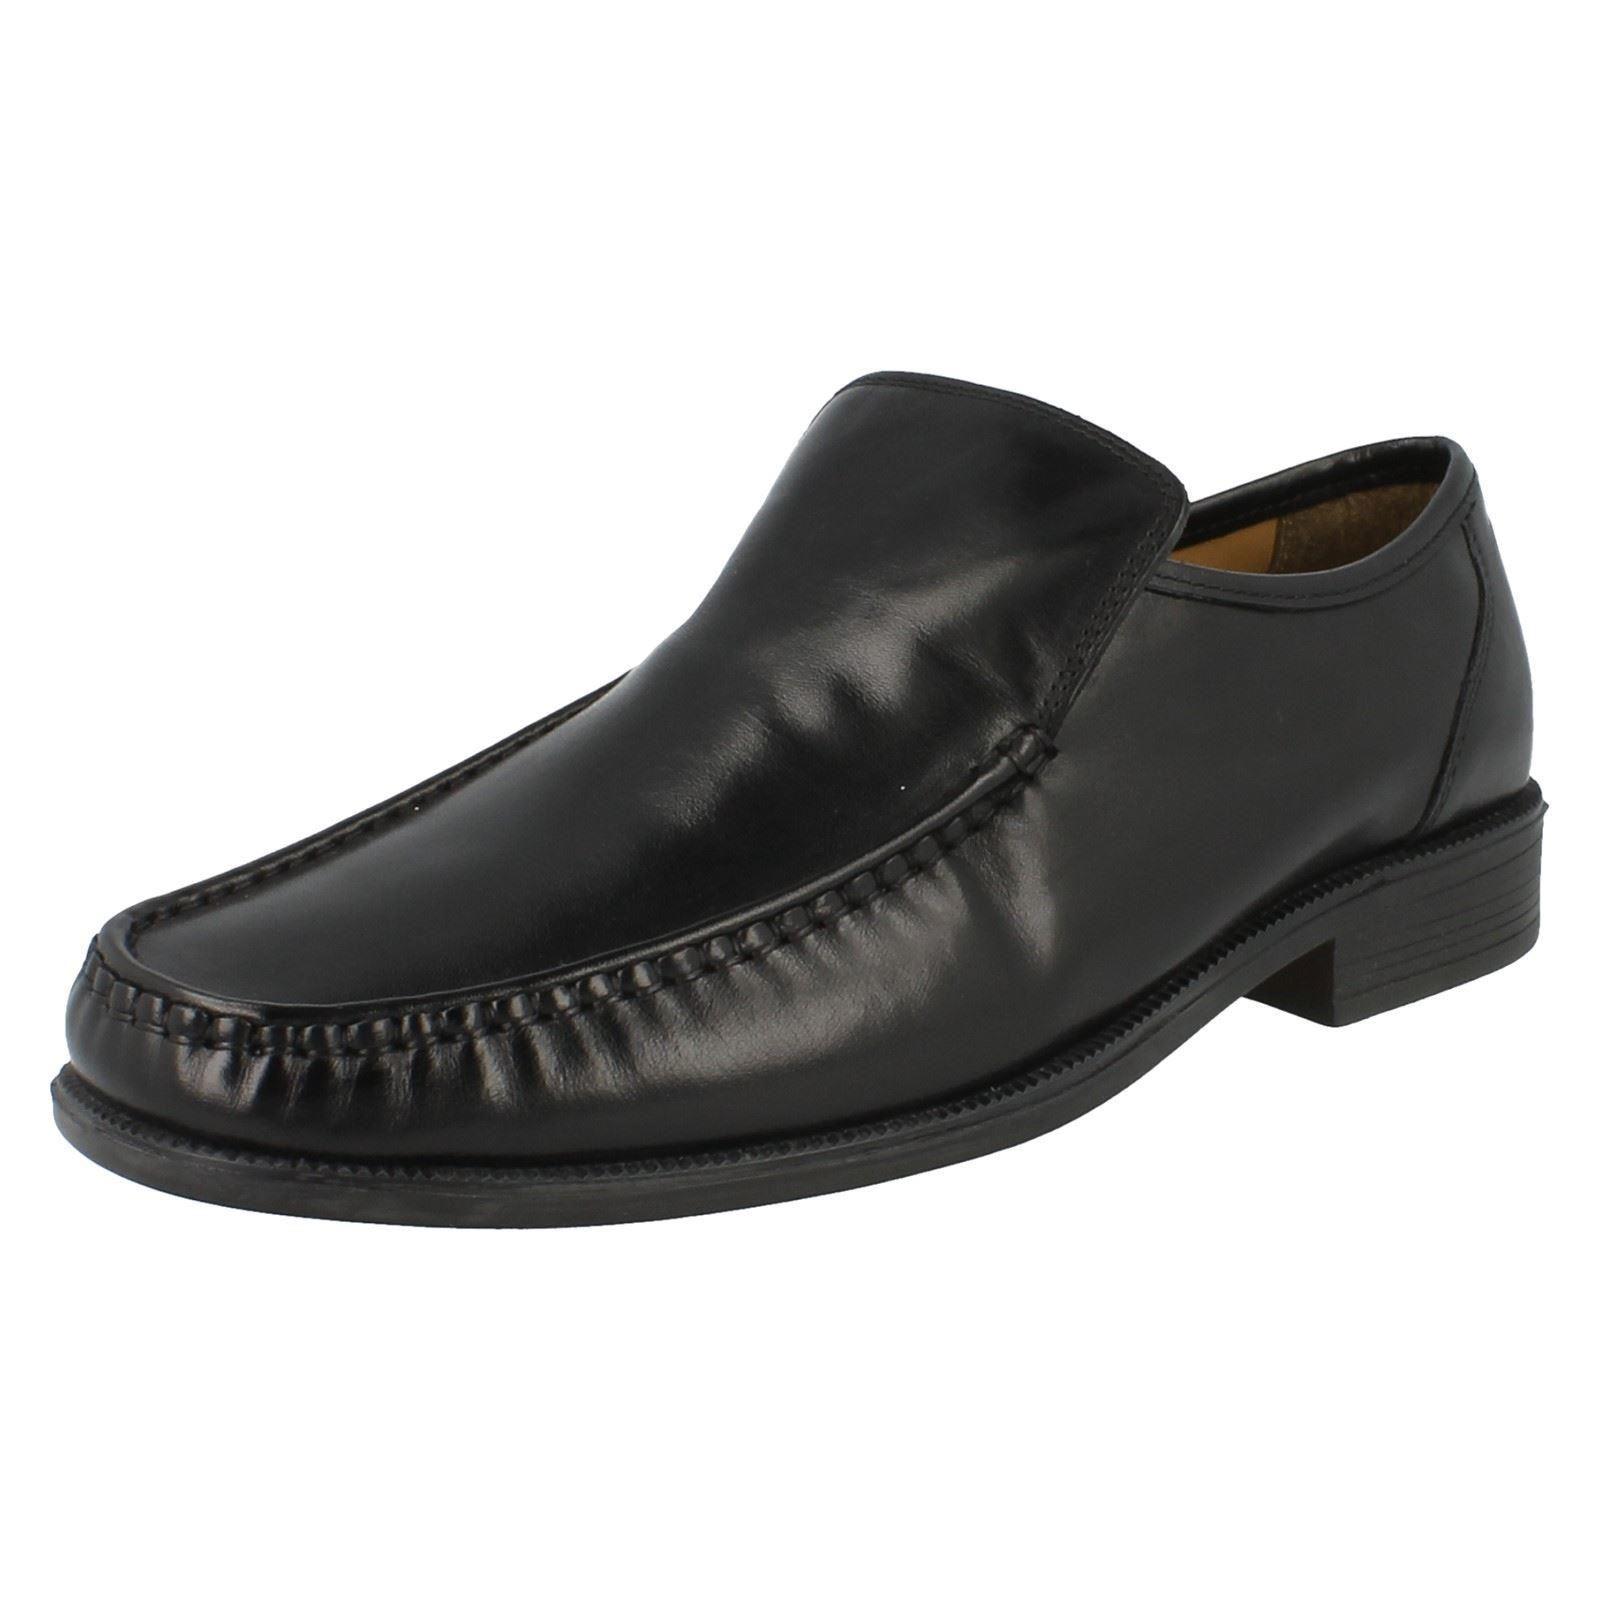 Clarks Beeston Cap Black Leather 10.5 UK H / 45 EU l2PNGZ